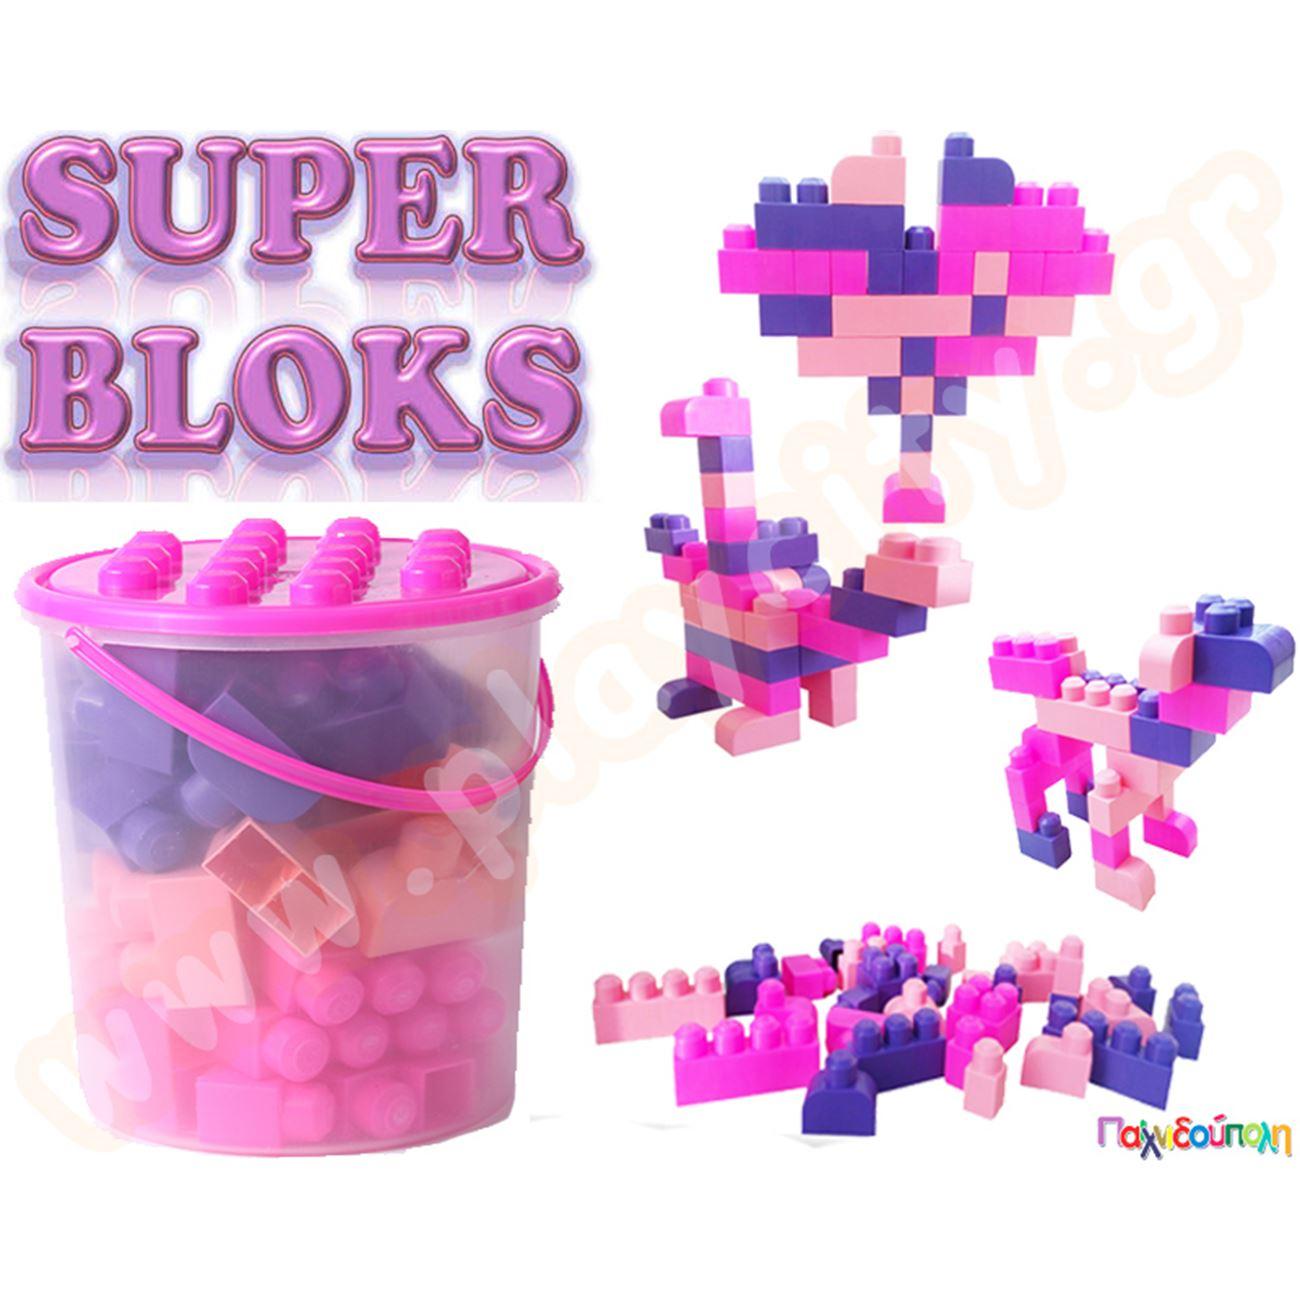 42d03c69b72 Κούνιες για μωρά και παιδιά Super κουβάς με 48 τουβλάκια (ροζ-μωβ ...